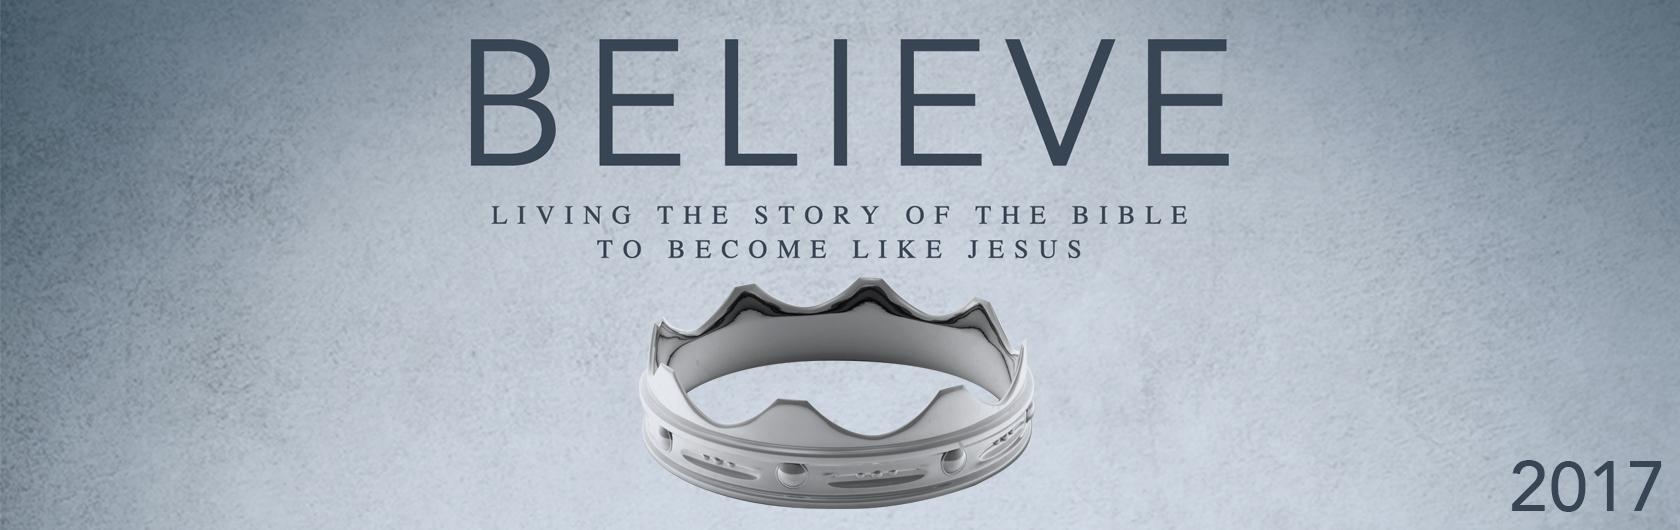 believe-web-banner